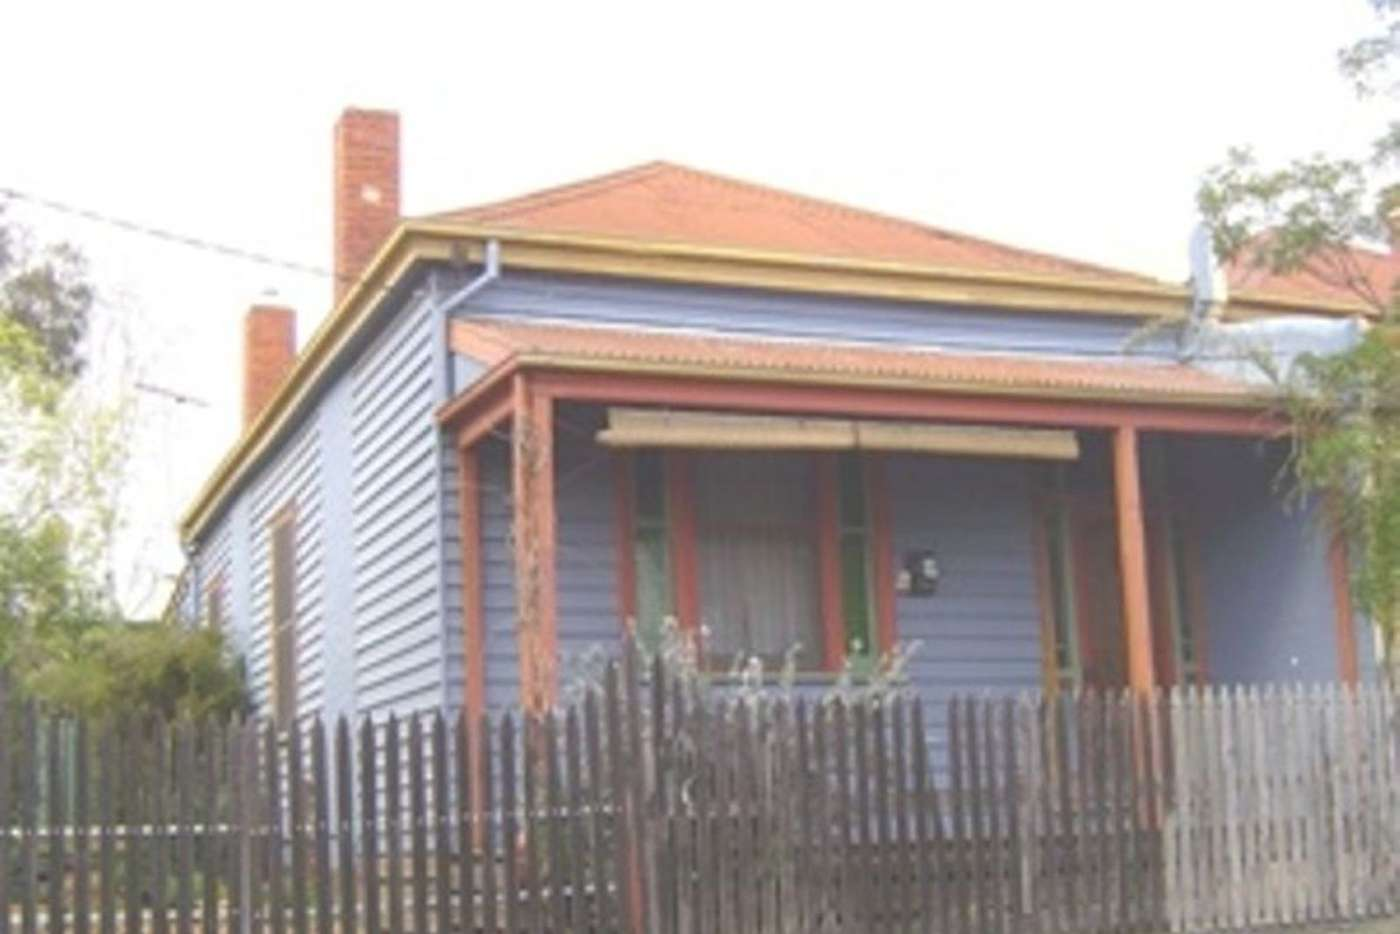 Sixth view of Homely house listing, 61 Gladstone Street, Bendigo VIC 3550